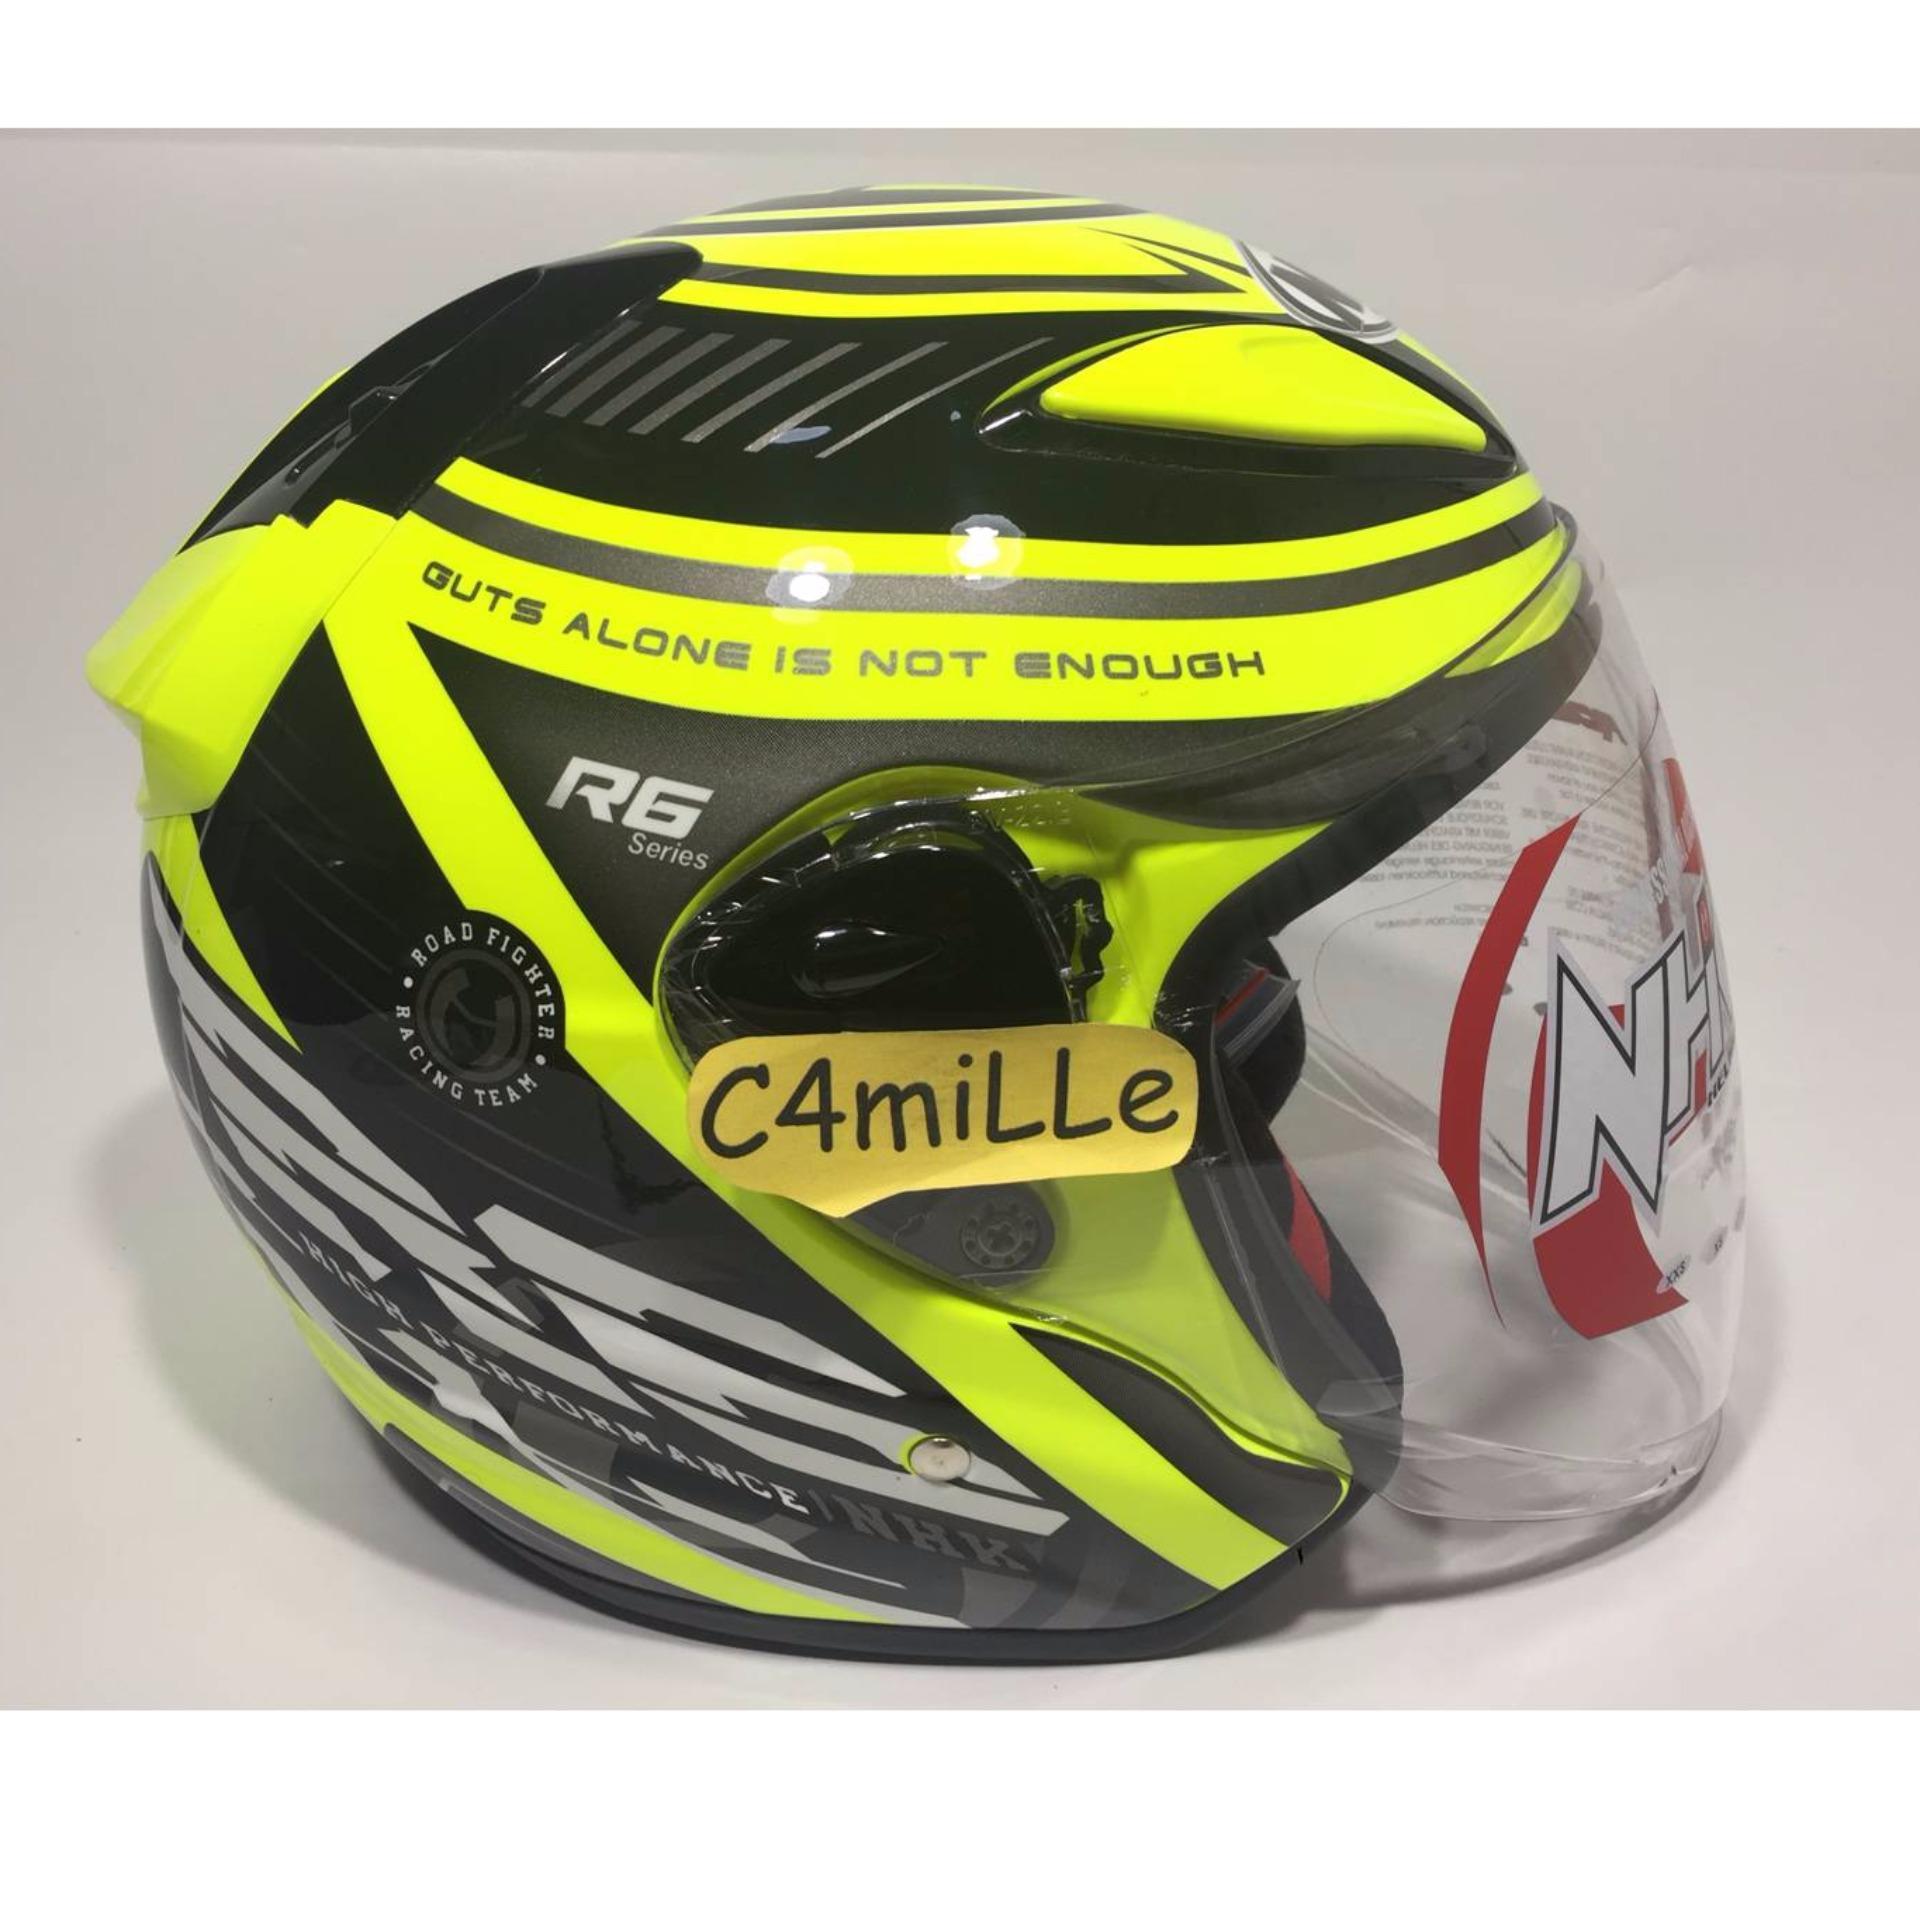 Perbandingan Harga Helm Nhk R6 Racer X Yellow Fluo Silver Half Face Full Gp1000 Xvision